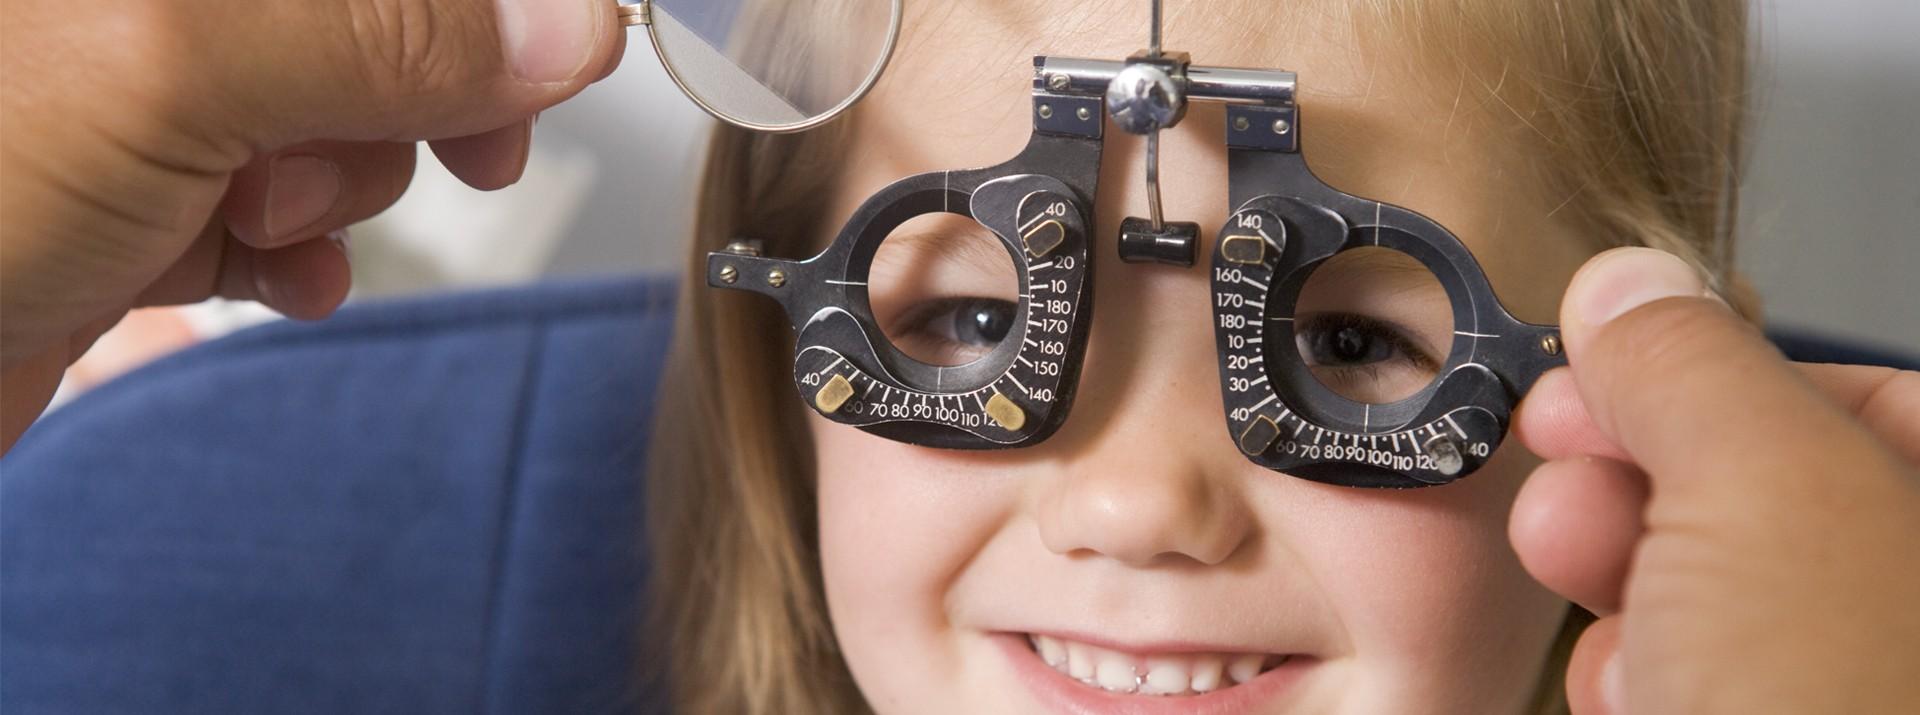 Great eye health begins with preventative eye exams